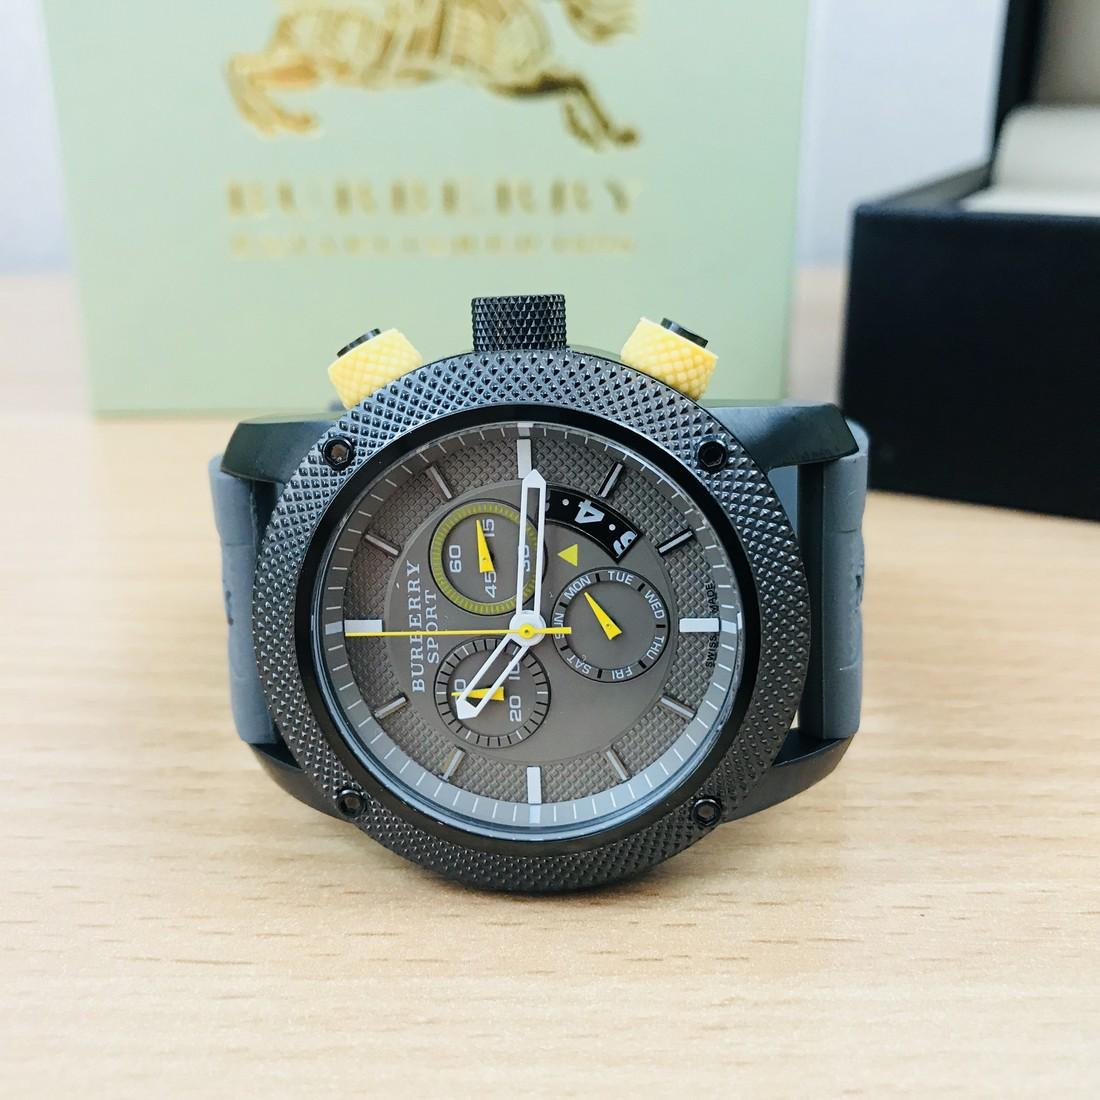 Burberry Endurance Swiss Made Men's Chronograph Watch - 4